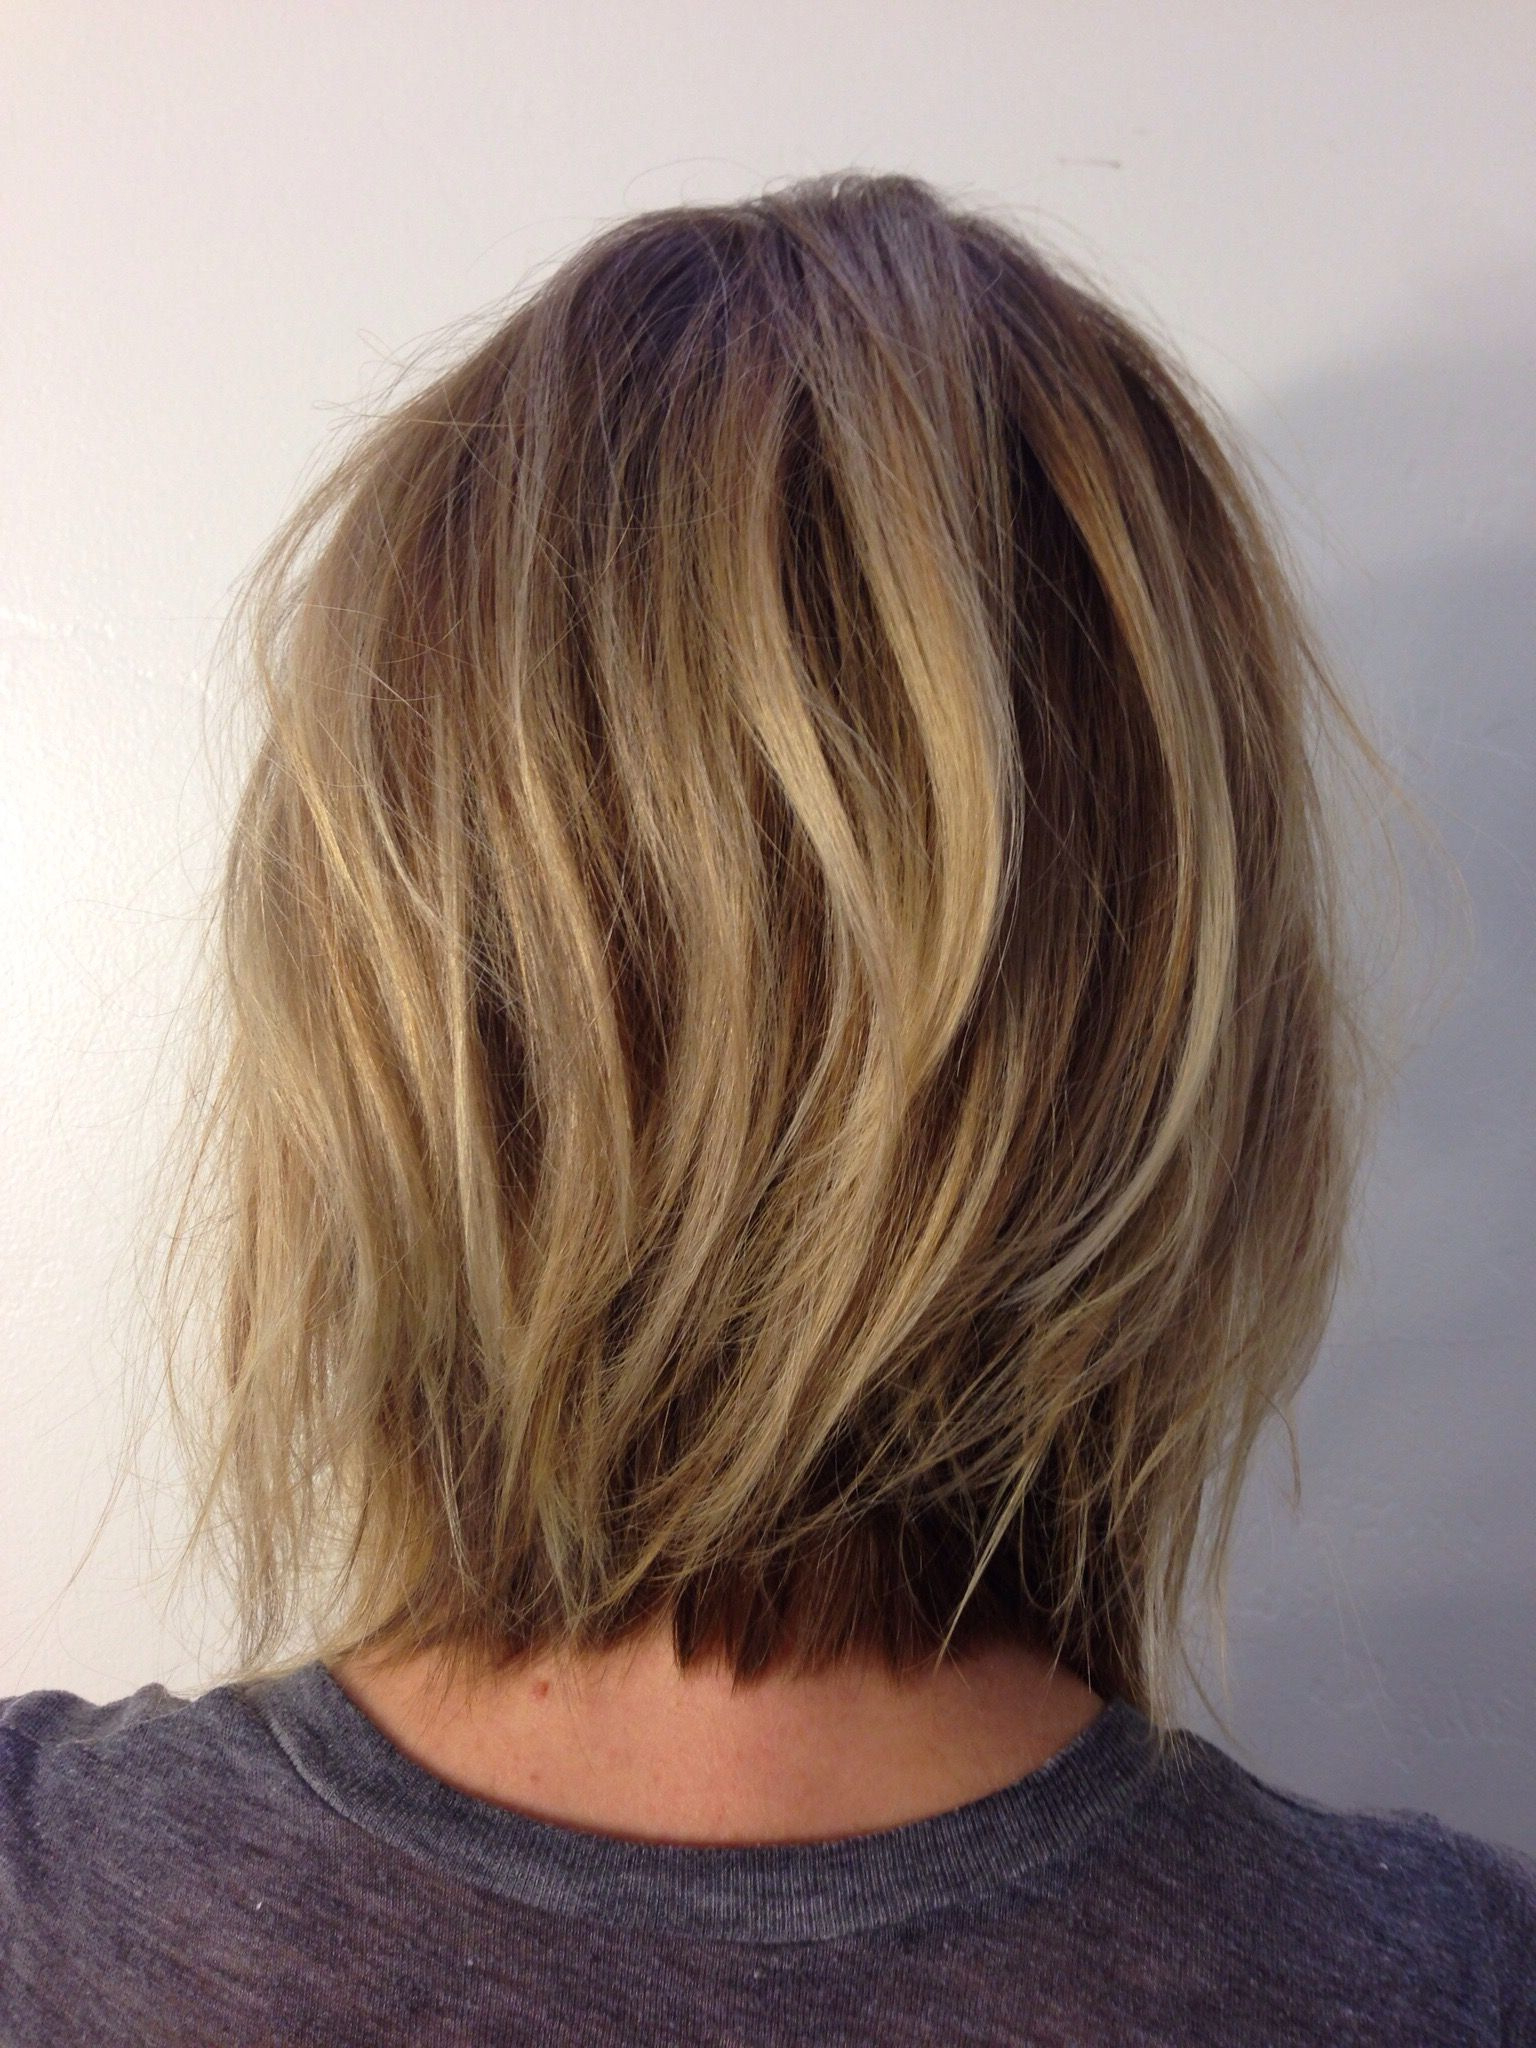 Hairstyles : Shoulder Length Choppy Bob Awe Inspiring For Shoulder Length Choppy Hairstyles (View 15 of 20)